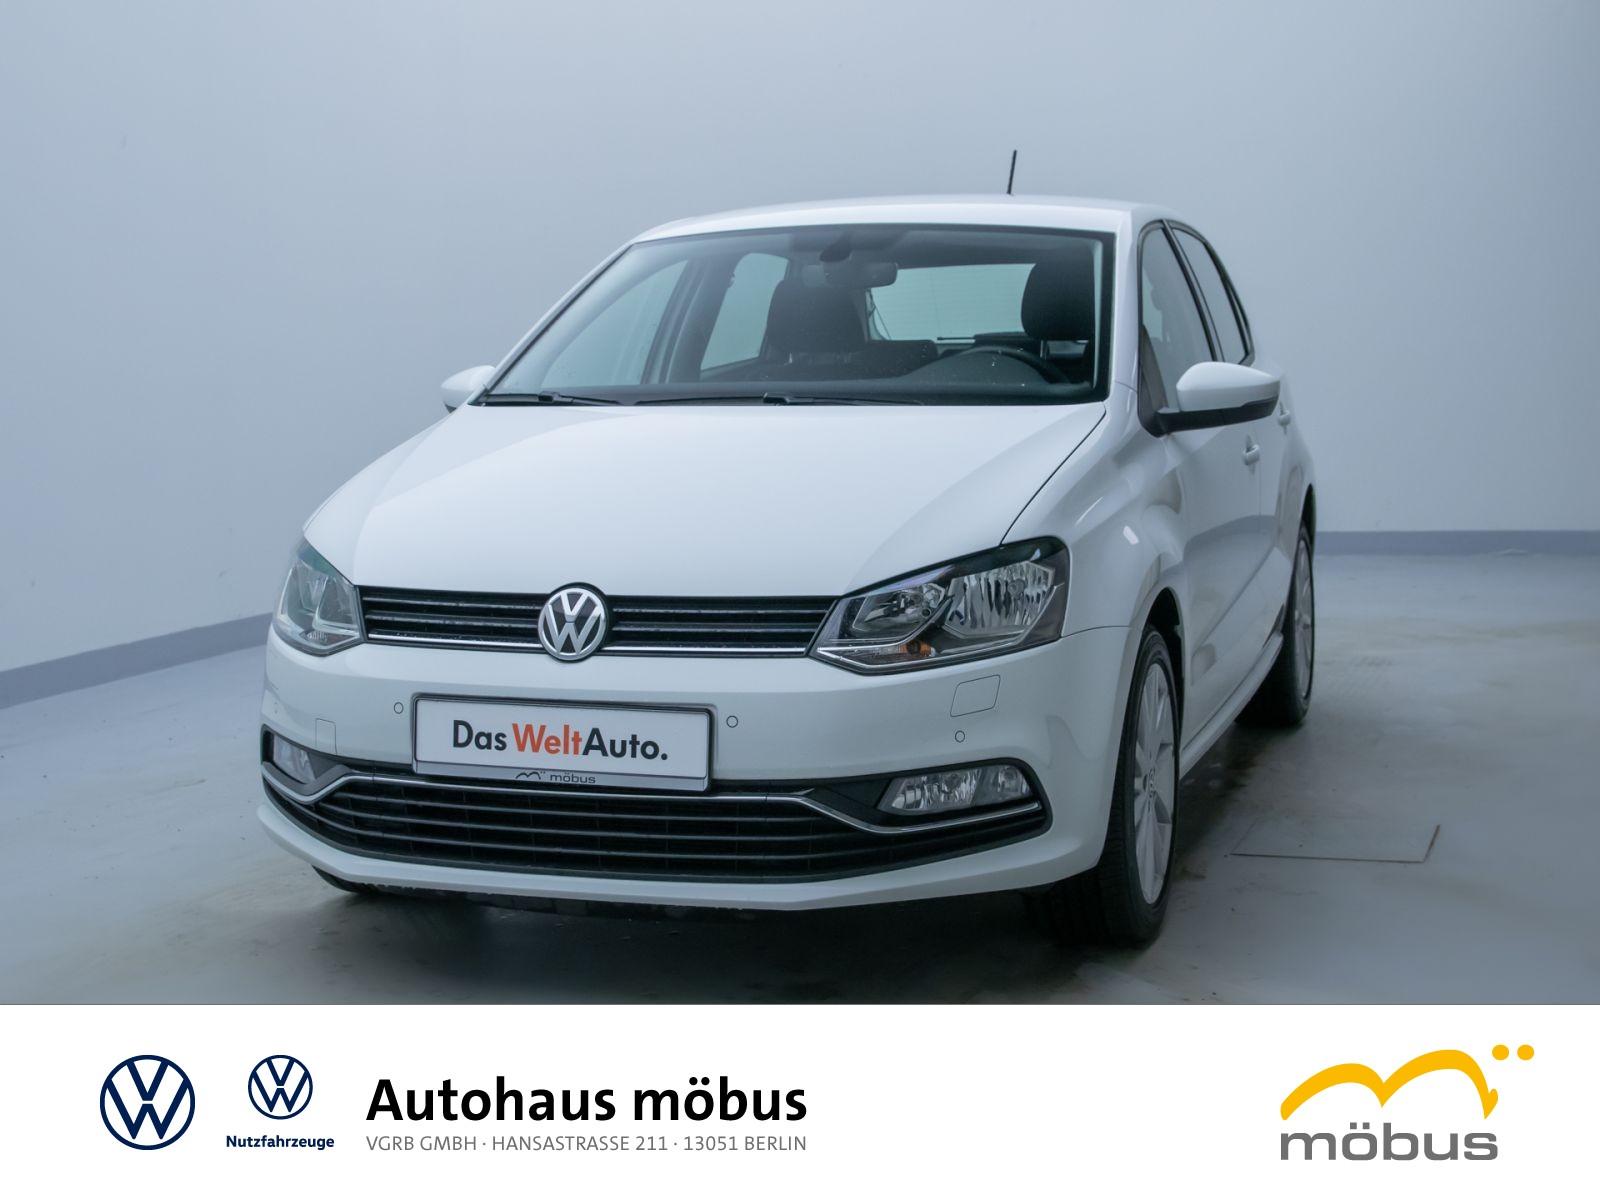 Volkswagen POLO 1.2 TSI*HIGHL*ASSIST*CLIMA*NAVI*PDC*MAL*GRA*, Jahr 2017, Benzin